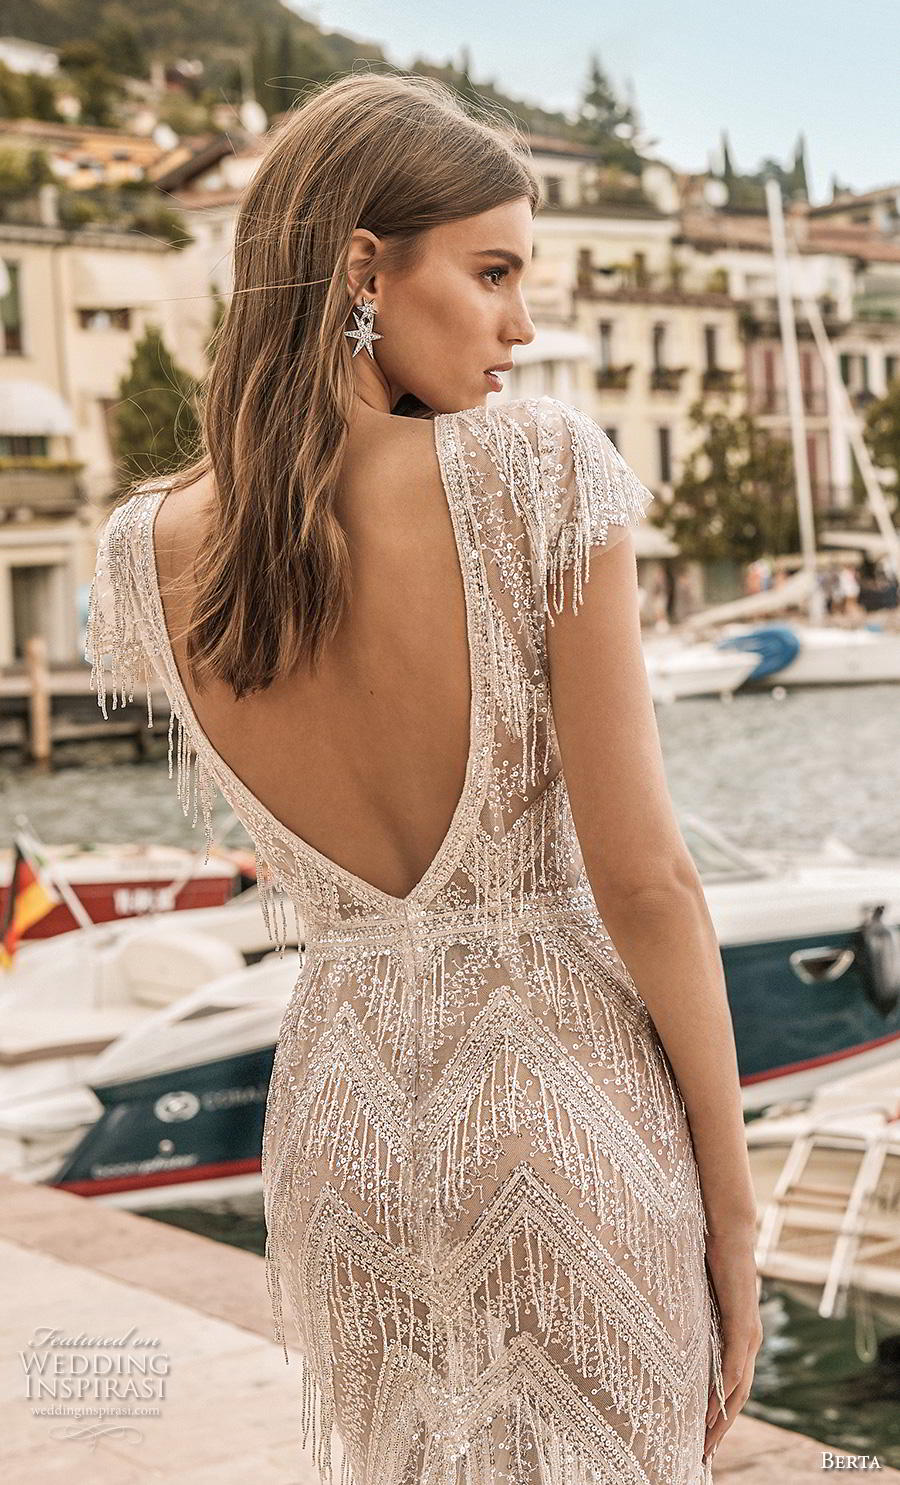 berta 2019 privee bridal cap sleeves deep v neck full embellishment glitzy elegant fit and flare wedding dress backless v back medium train (10) zbv